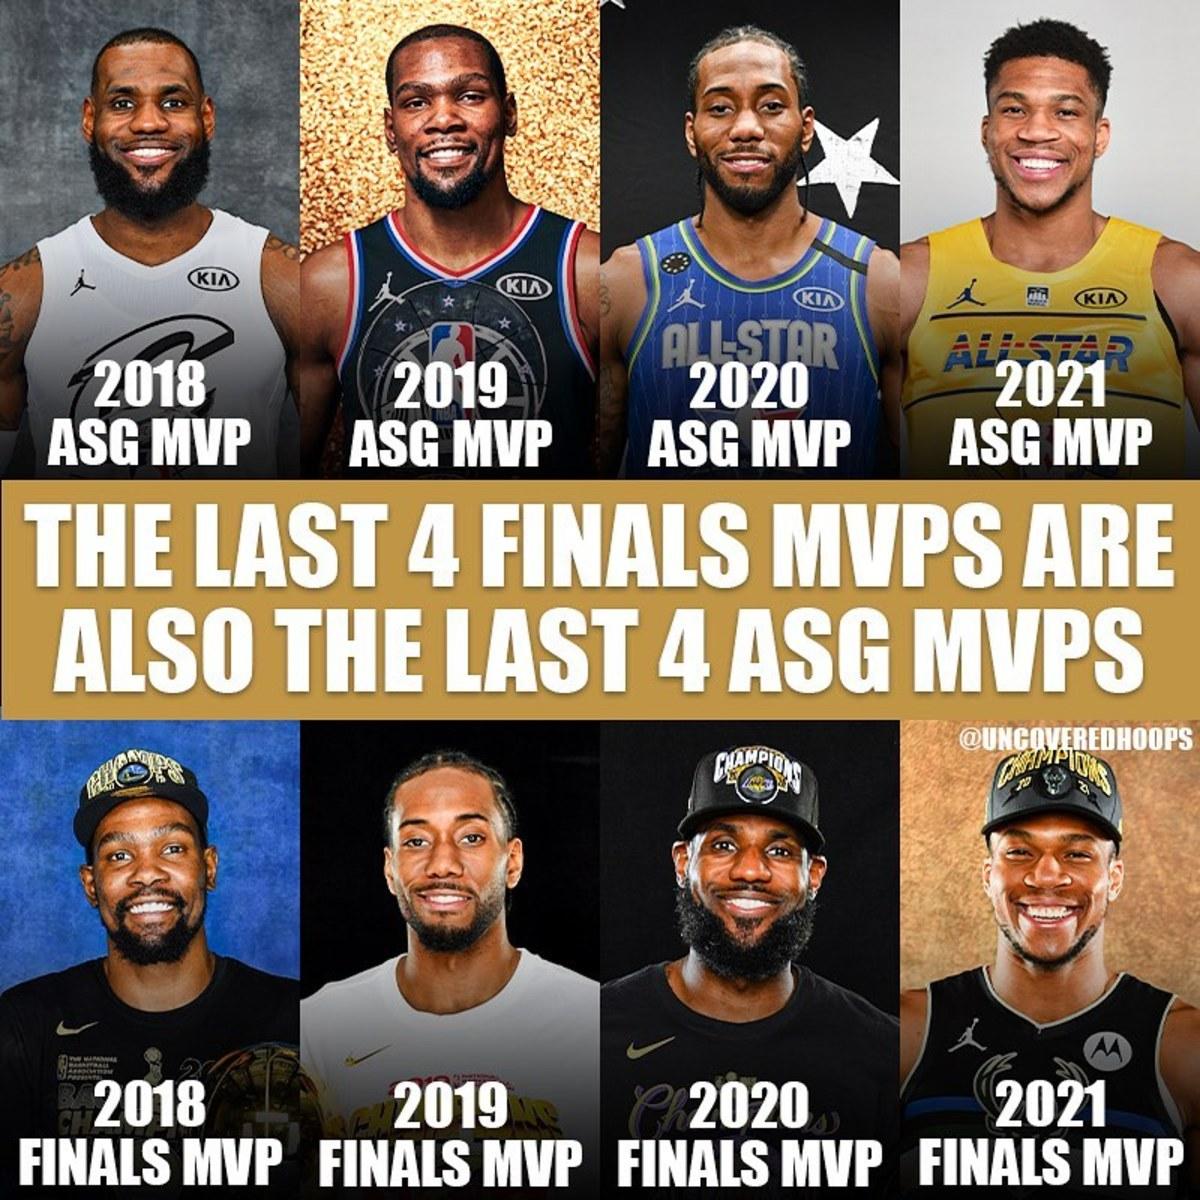 Credit: IG/NBA Uncovered